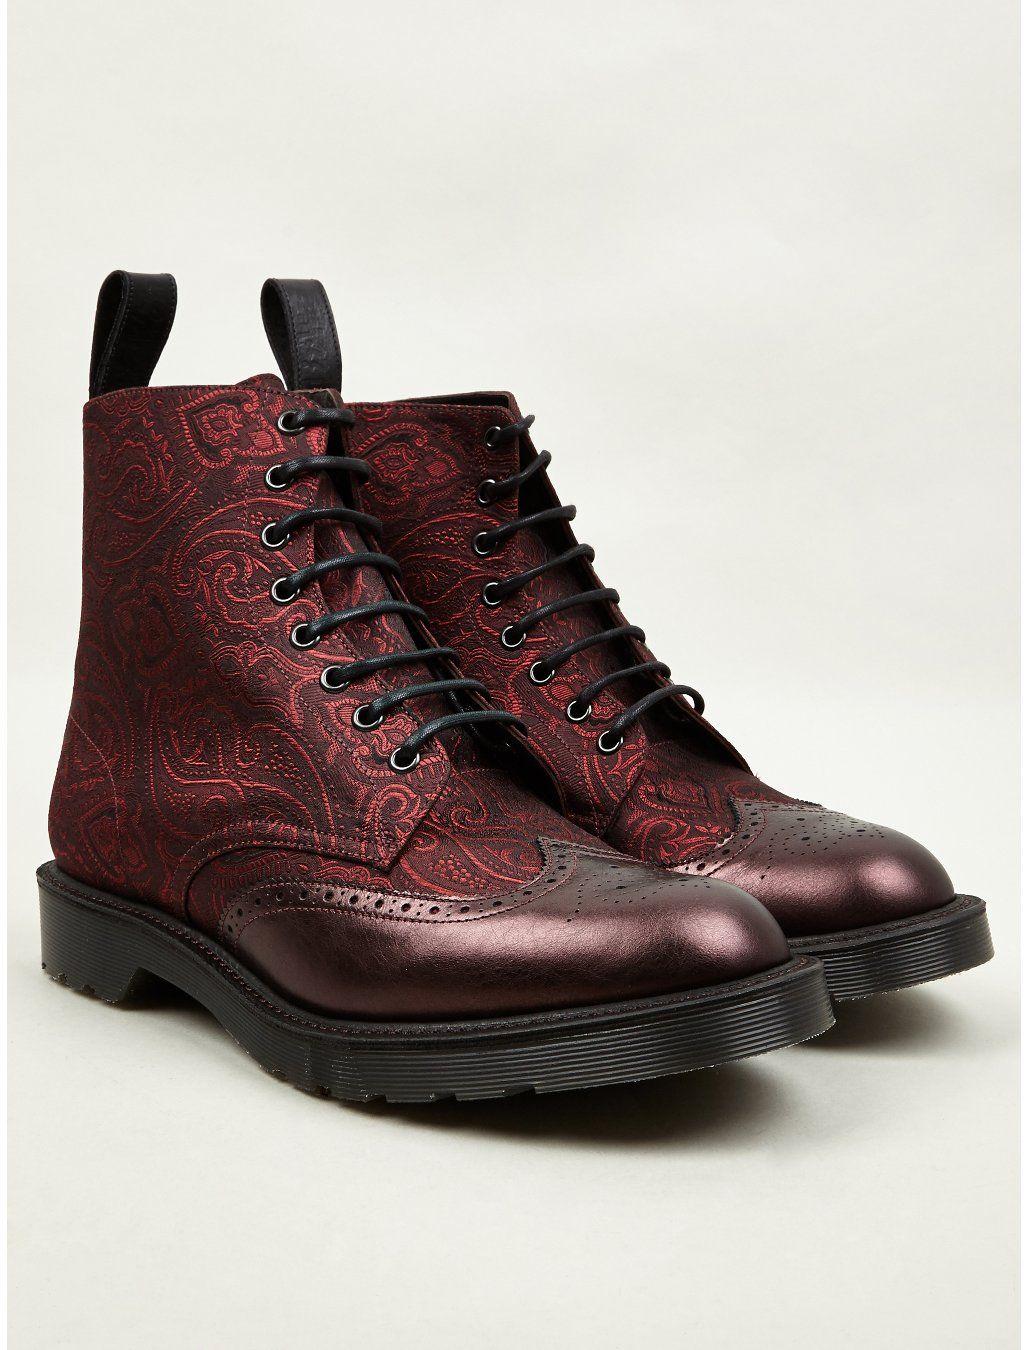 Dr Martens - Men s Cherry Red MIE Calder Paisley Silk Boots  058a2817ce1a